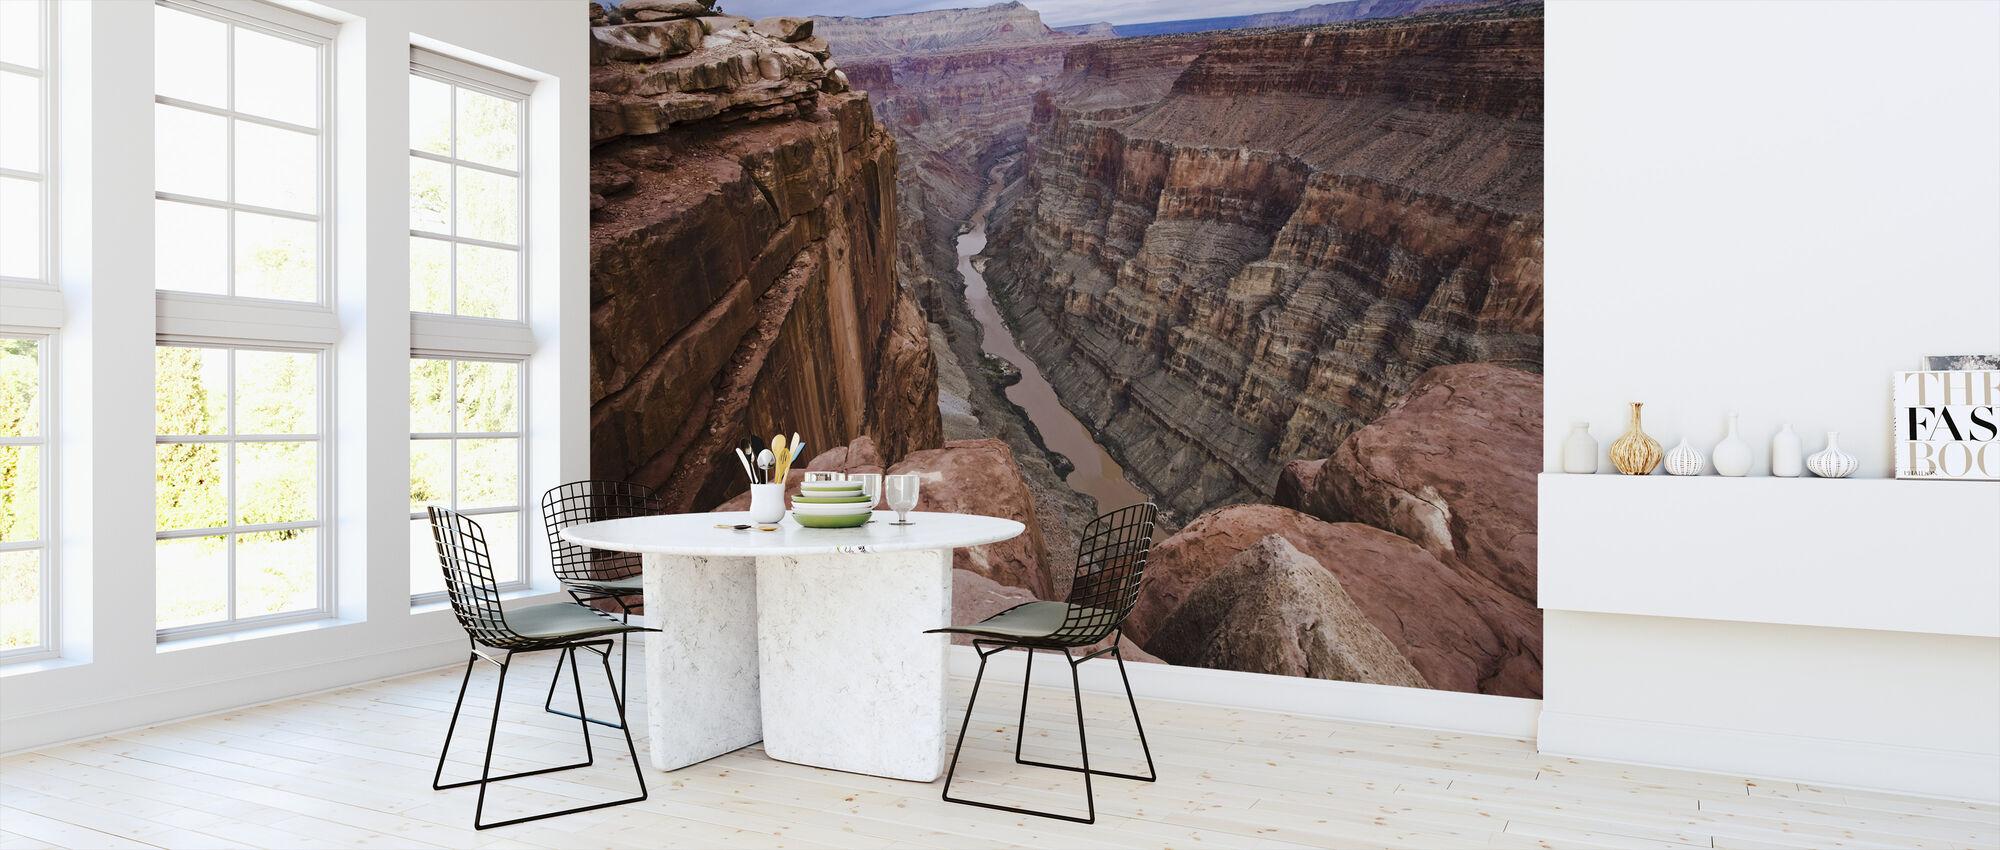 Hoog boven de rivier de Colorado - Behang - Keuken